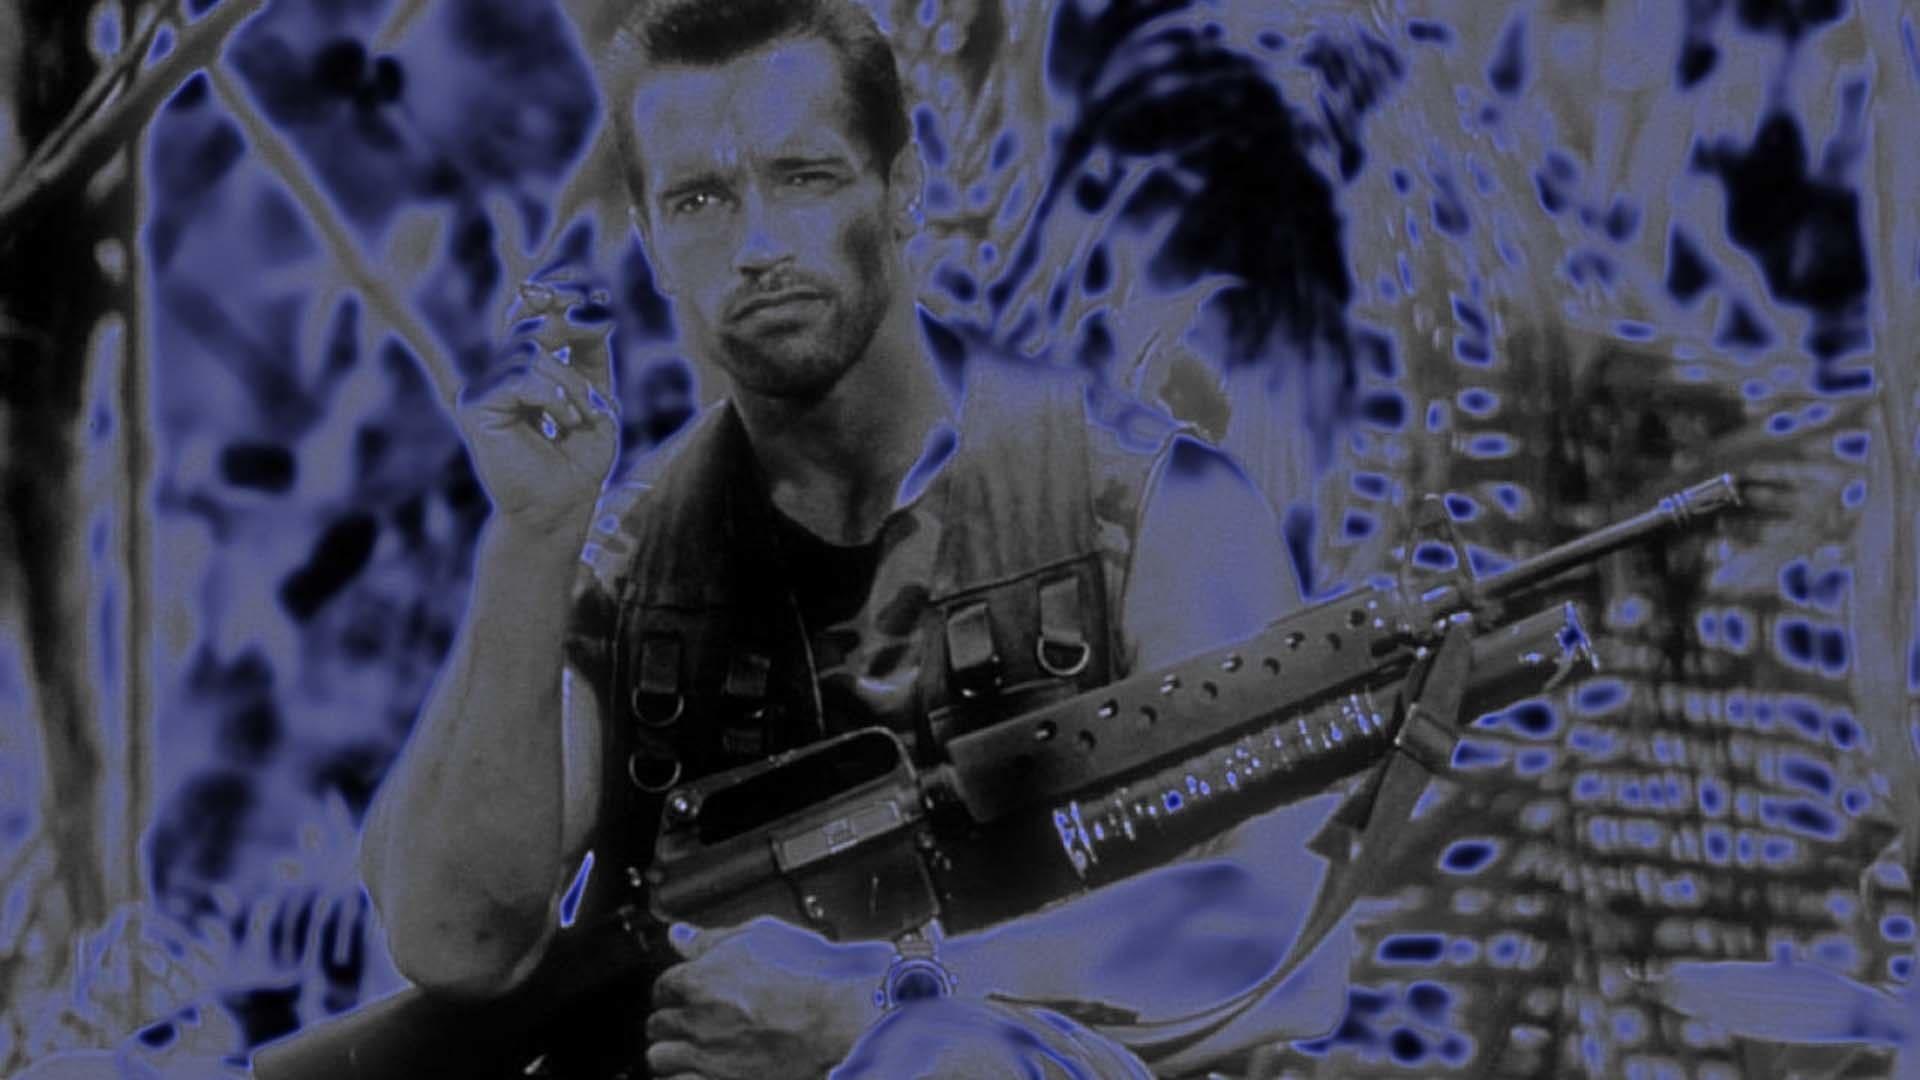 Predator 1987 Stream Film Complet Vf Francais Le Major Dutch Schaefer Et Son Equipe Sont Envoyes Dans La Jung Free Movies Online Full Movies Full Movies Online